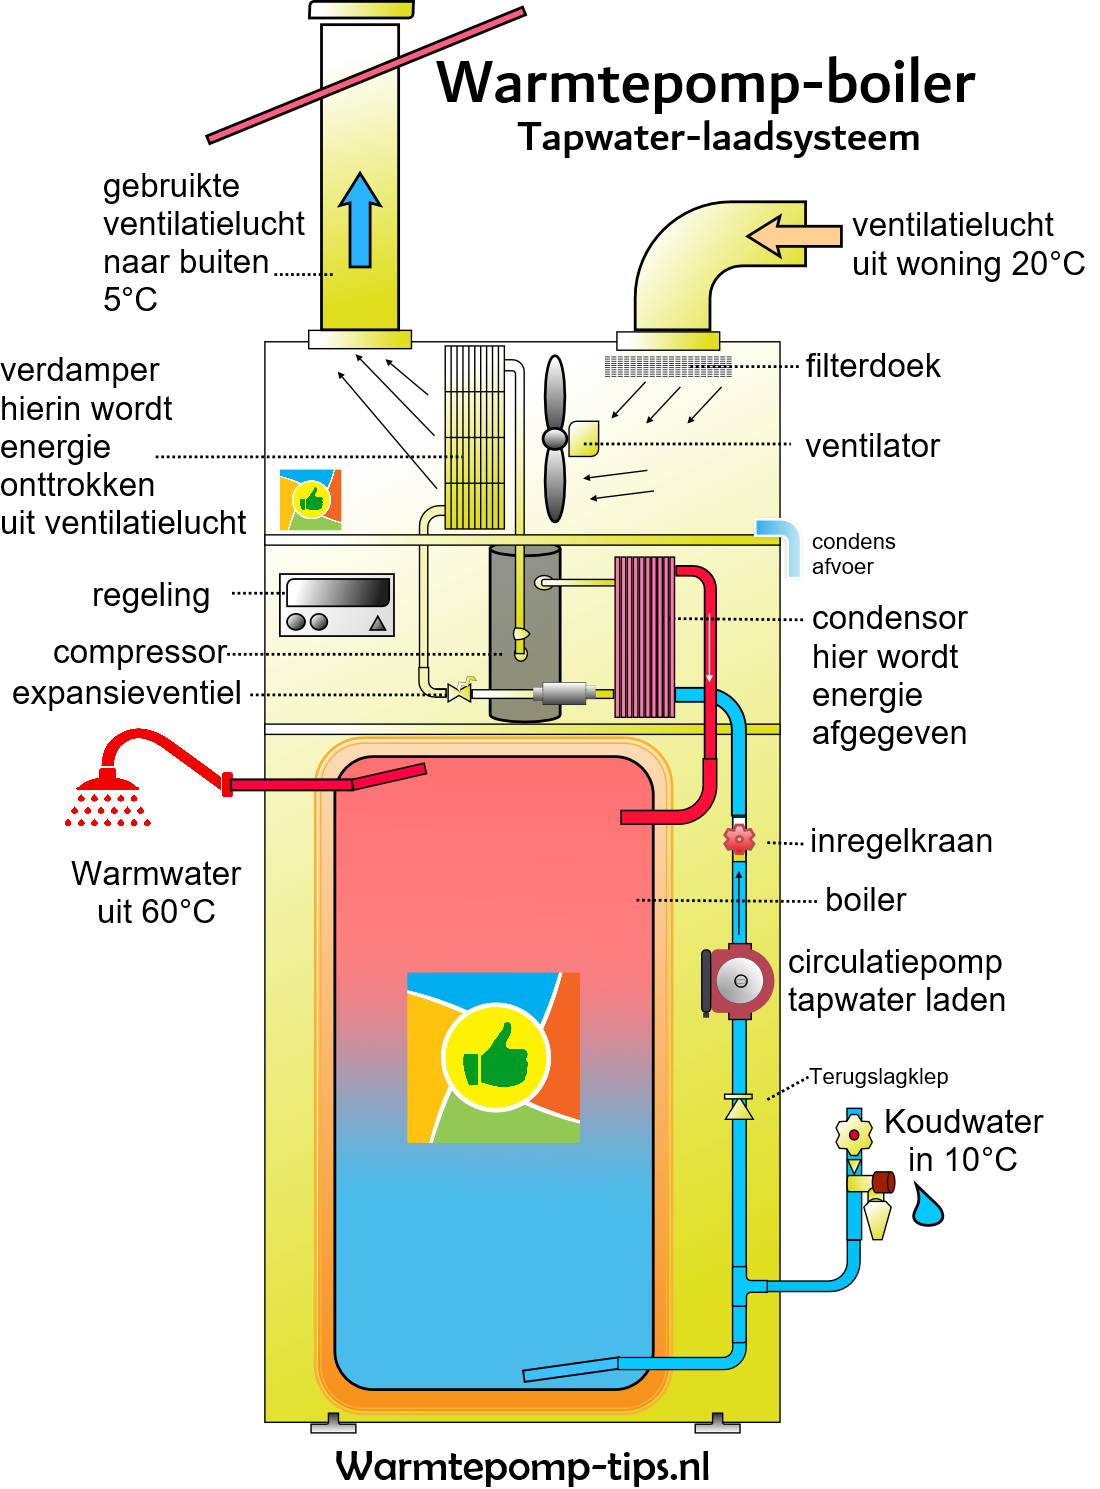 Warmtepomp boiler tapwaterlaadsysteem